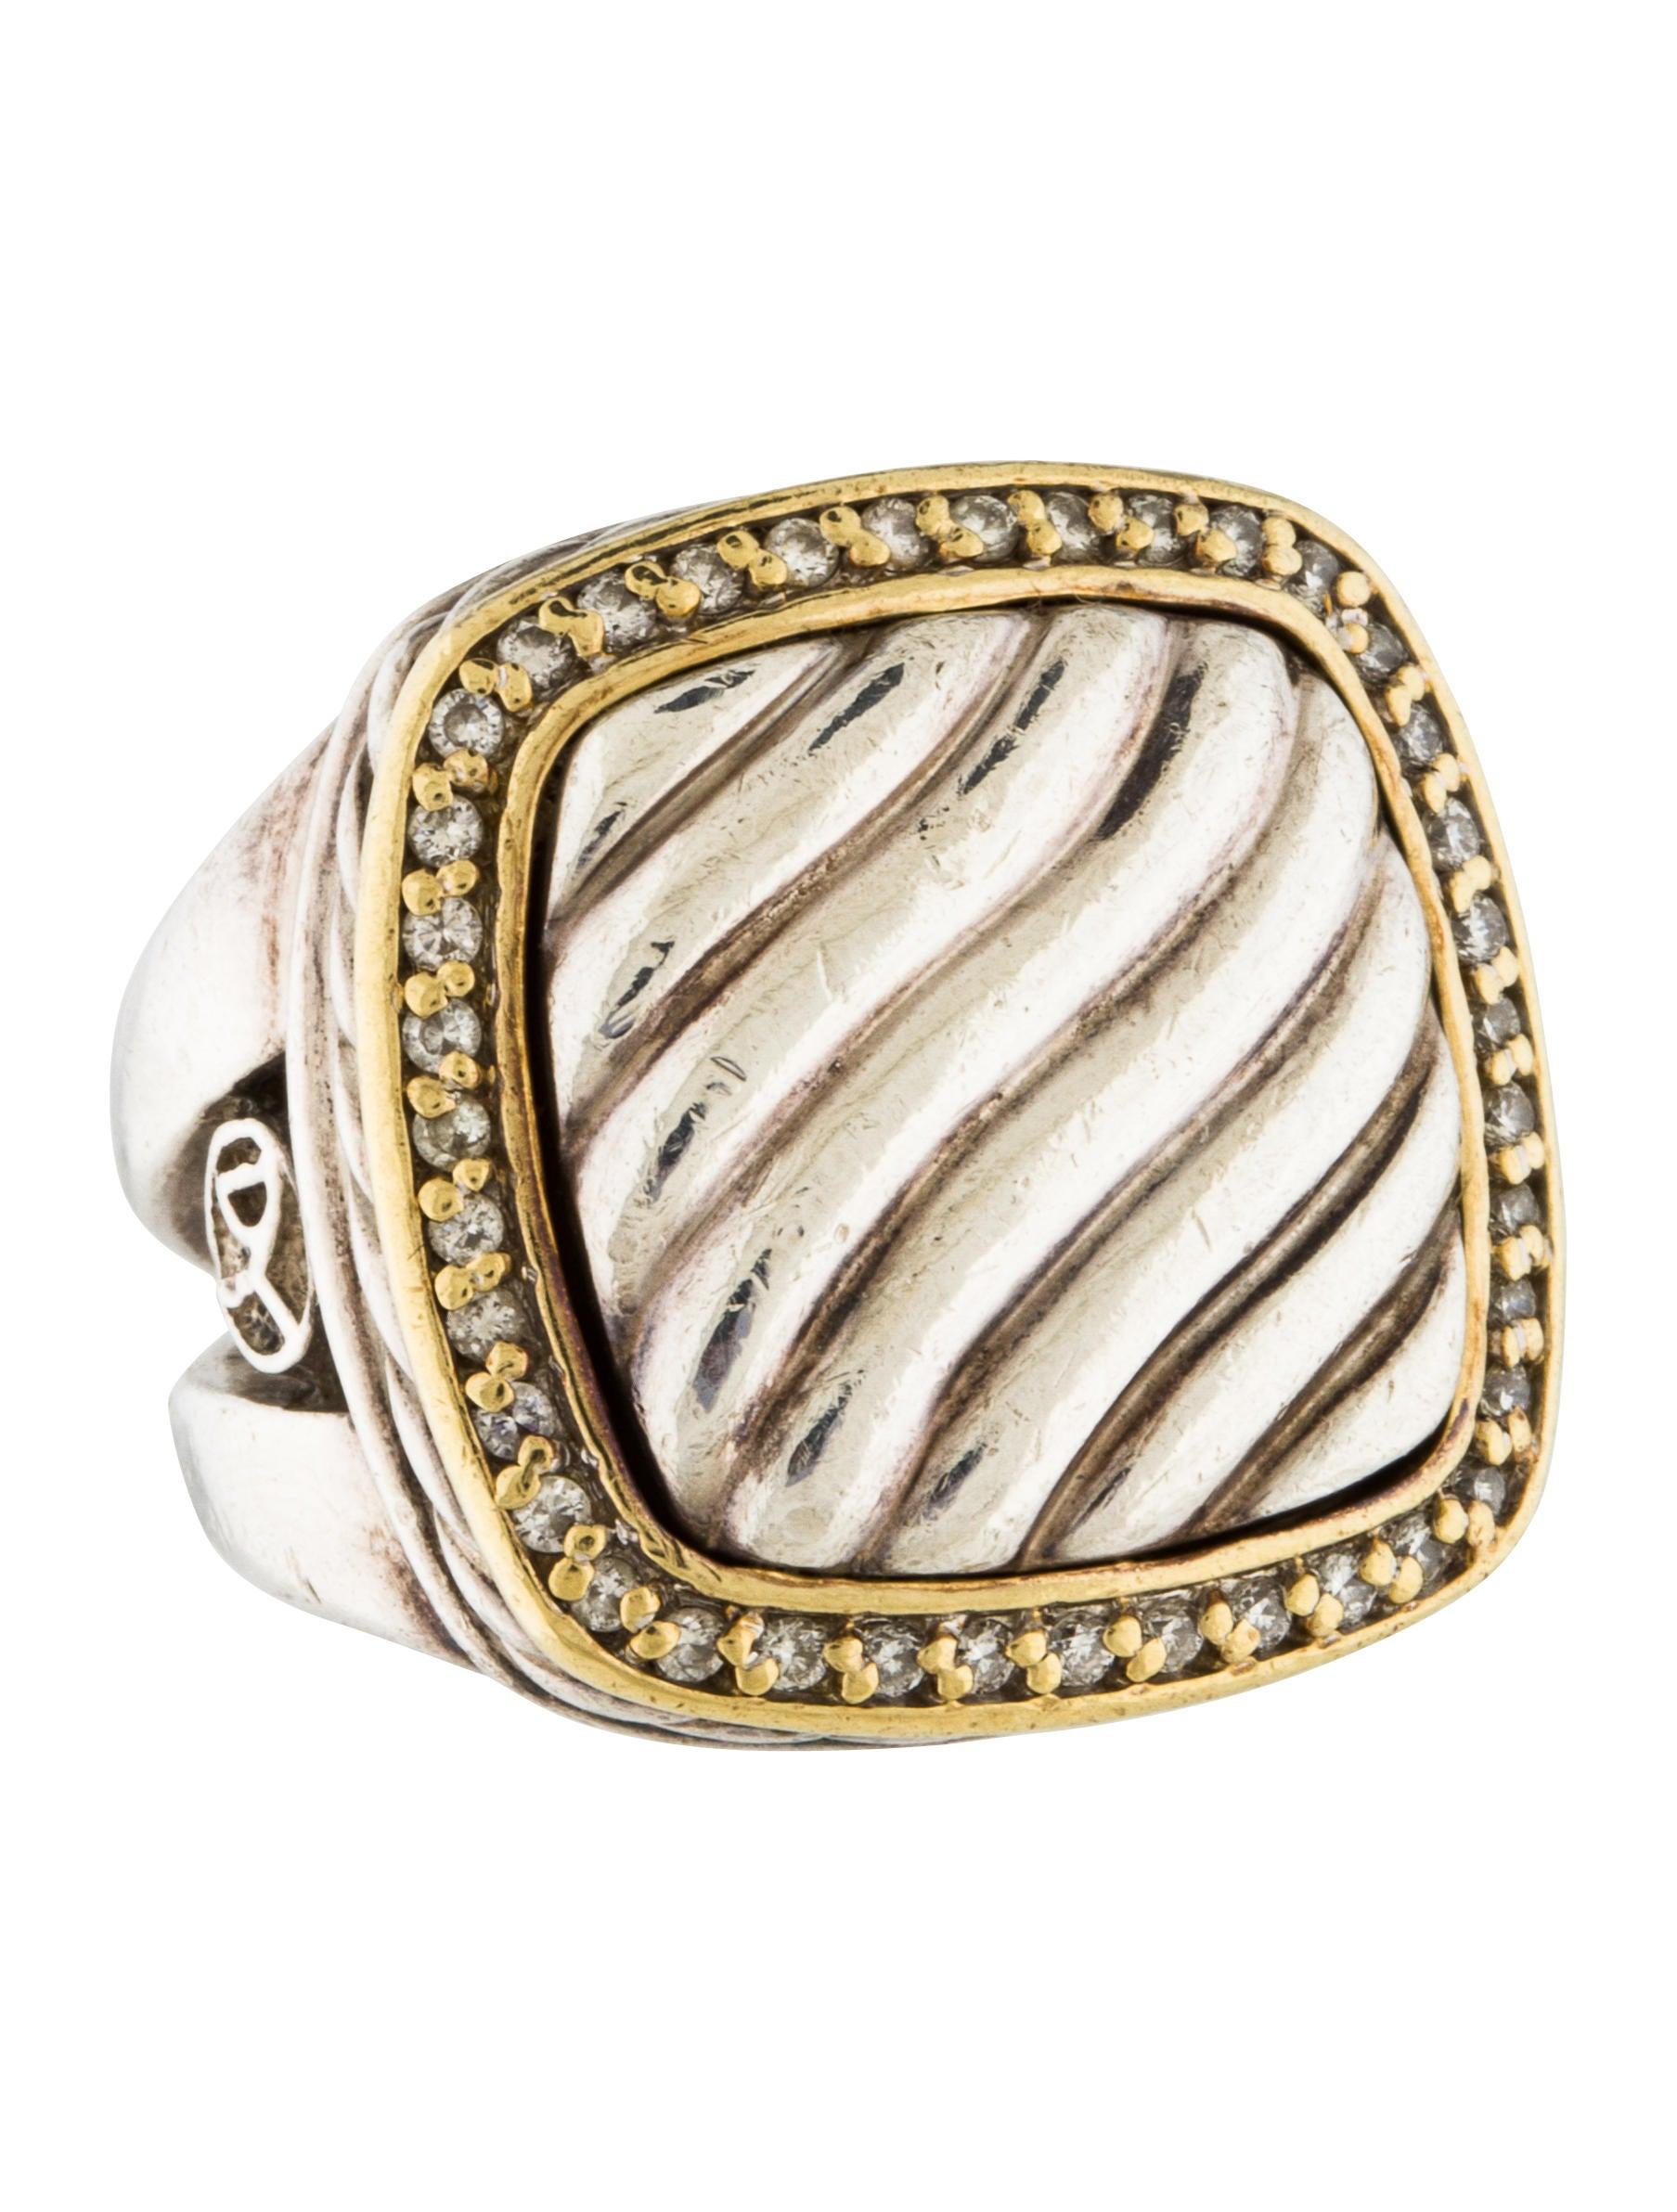 David yurman two tone diamond cable ring rings for David yurman inspired jewelry rings